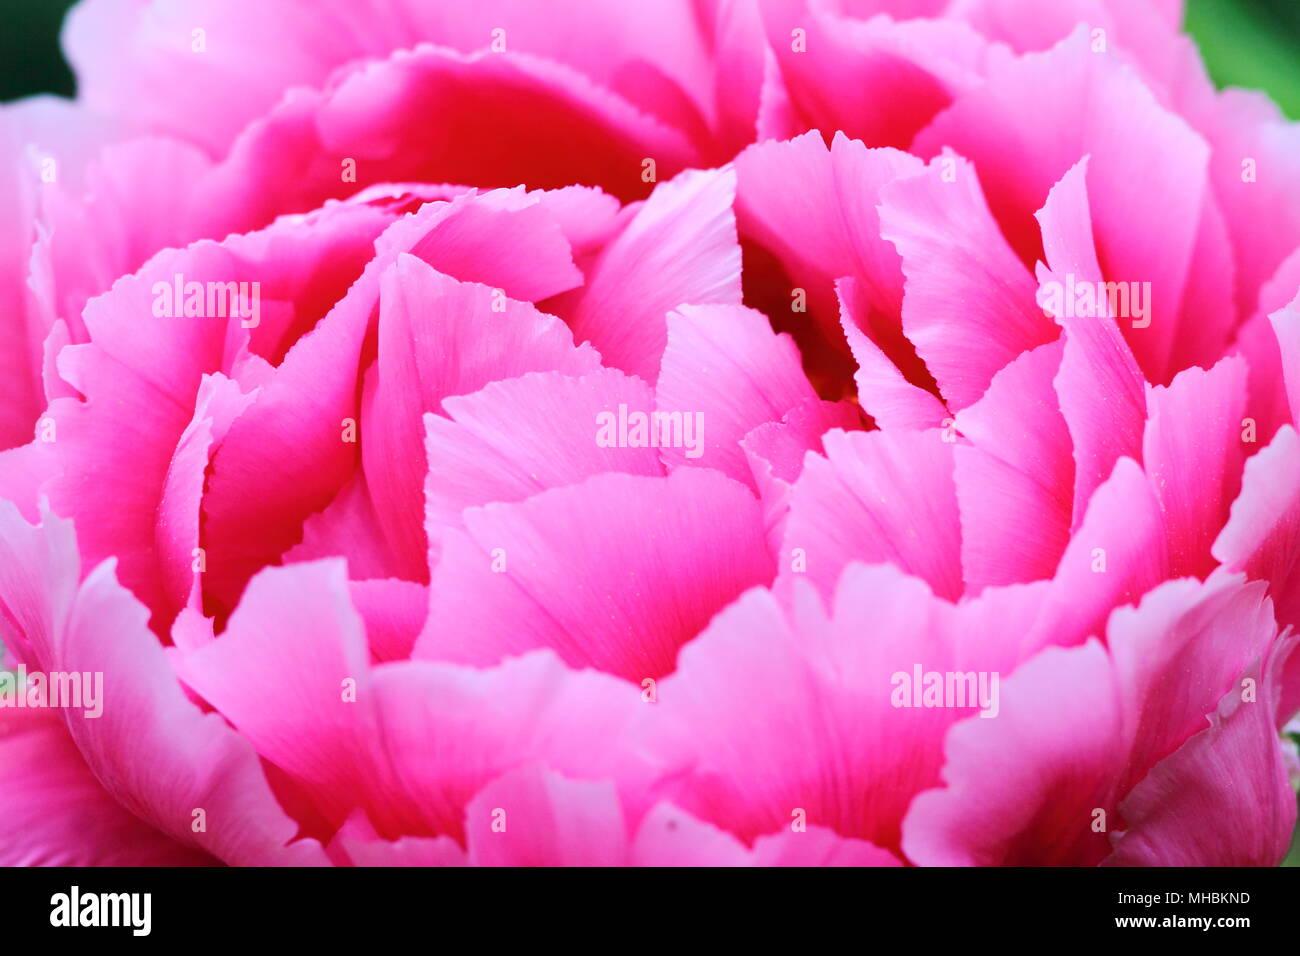 Large bright pink peony flowerhead close up. Lavish petals texture. - Stock Image